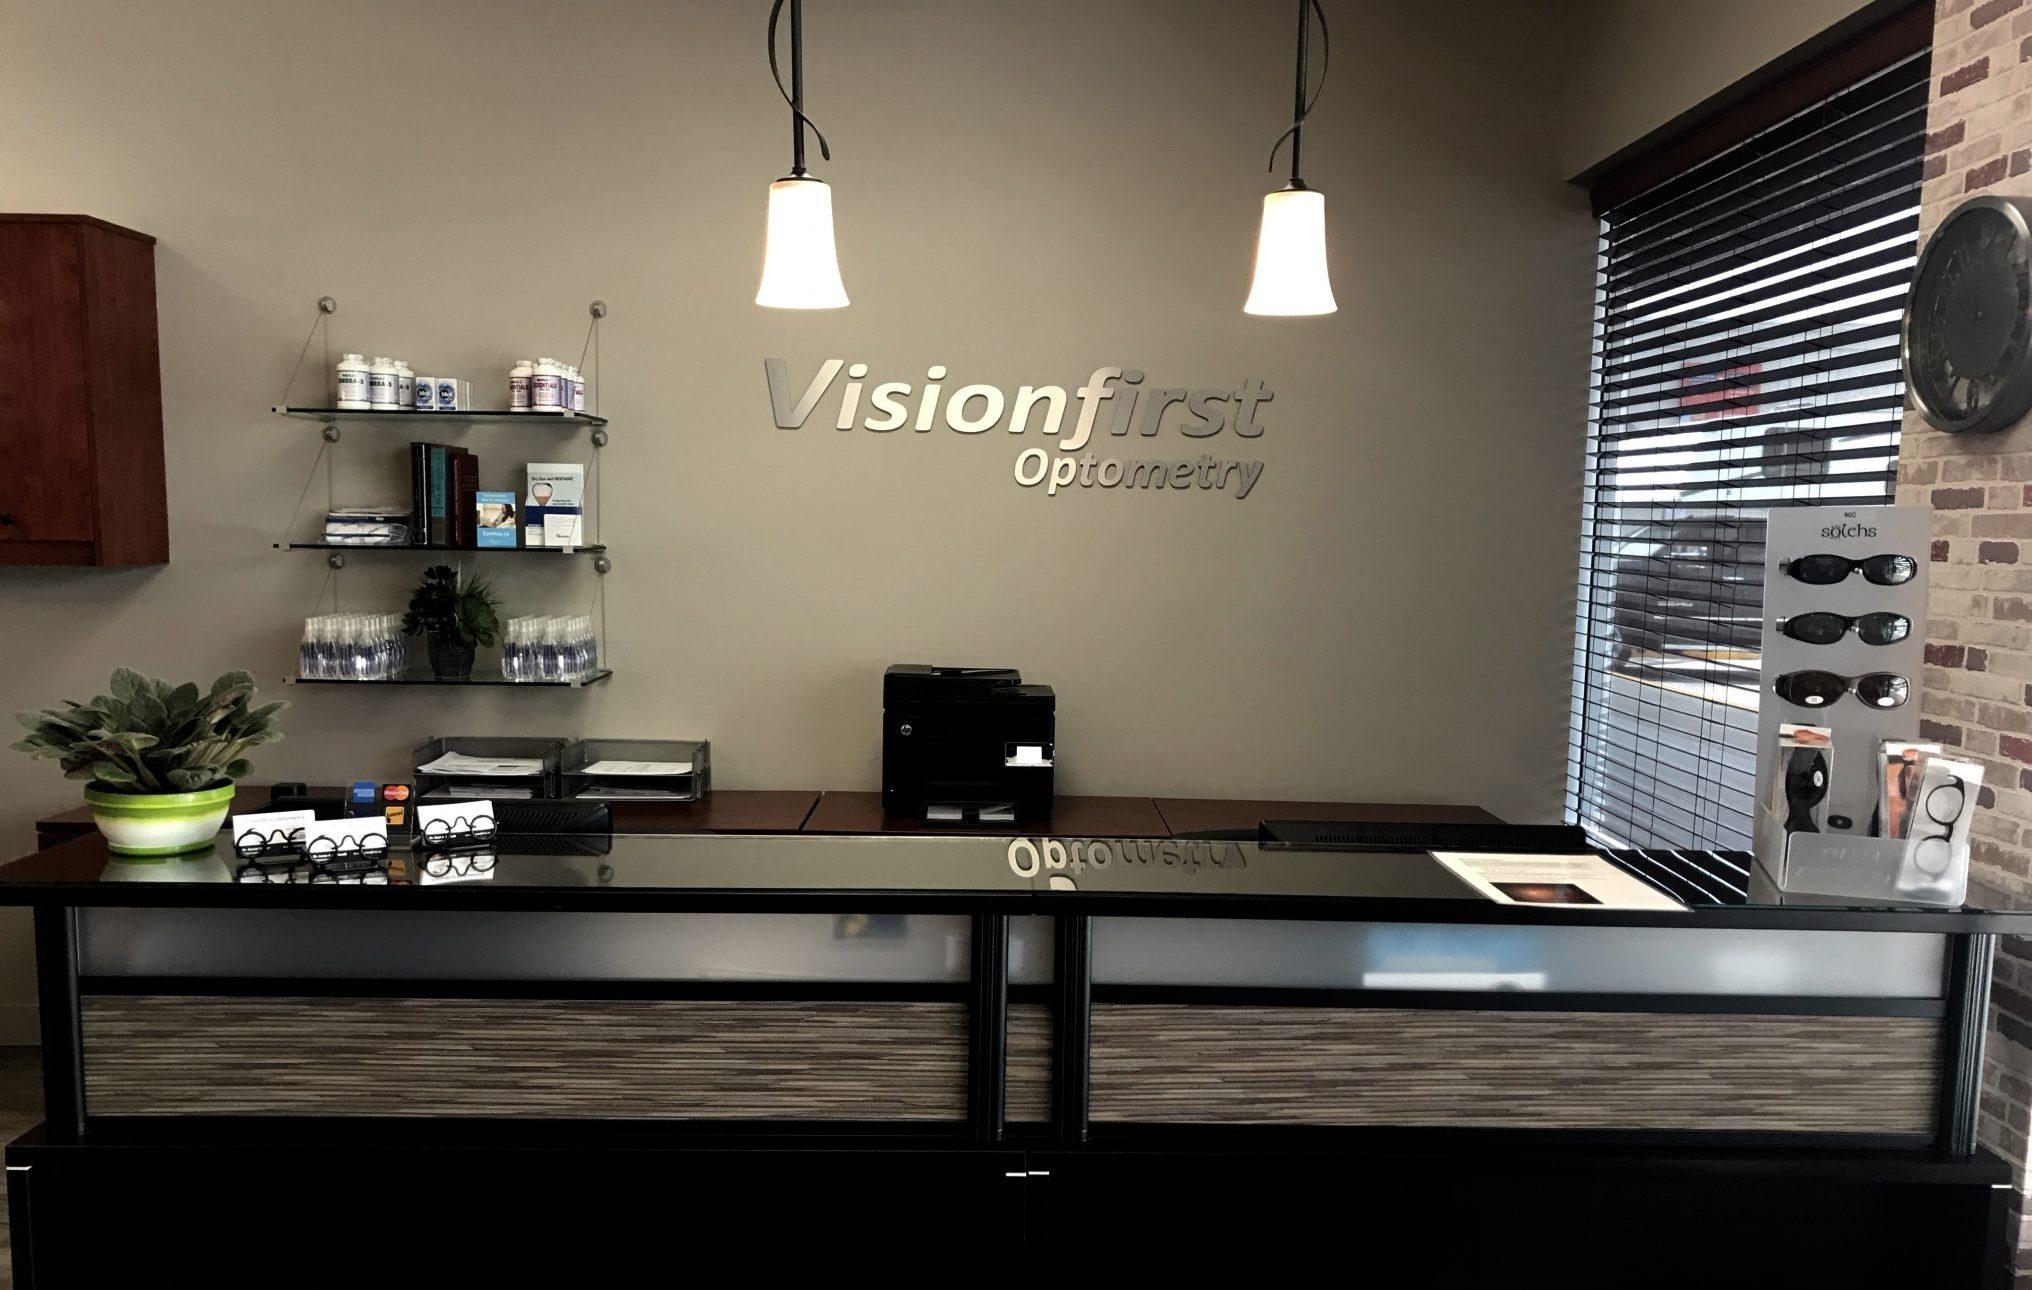 VisionFirst Reception